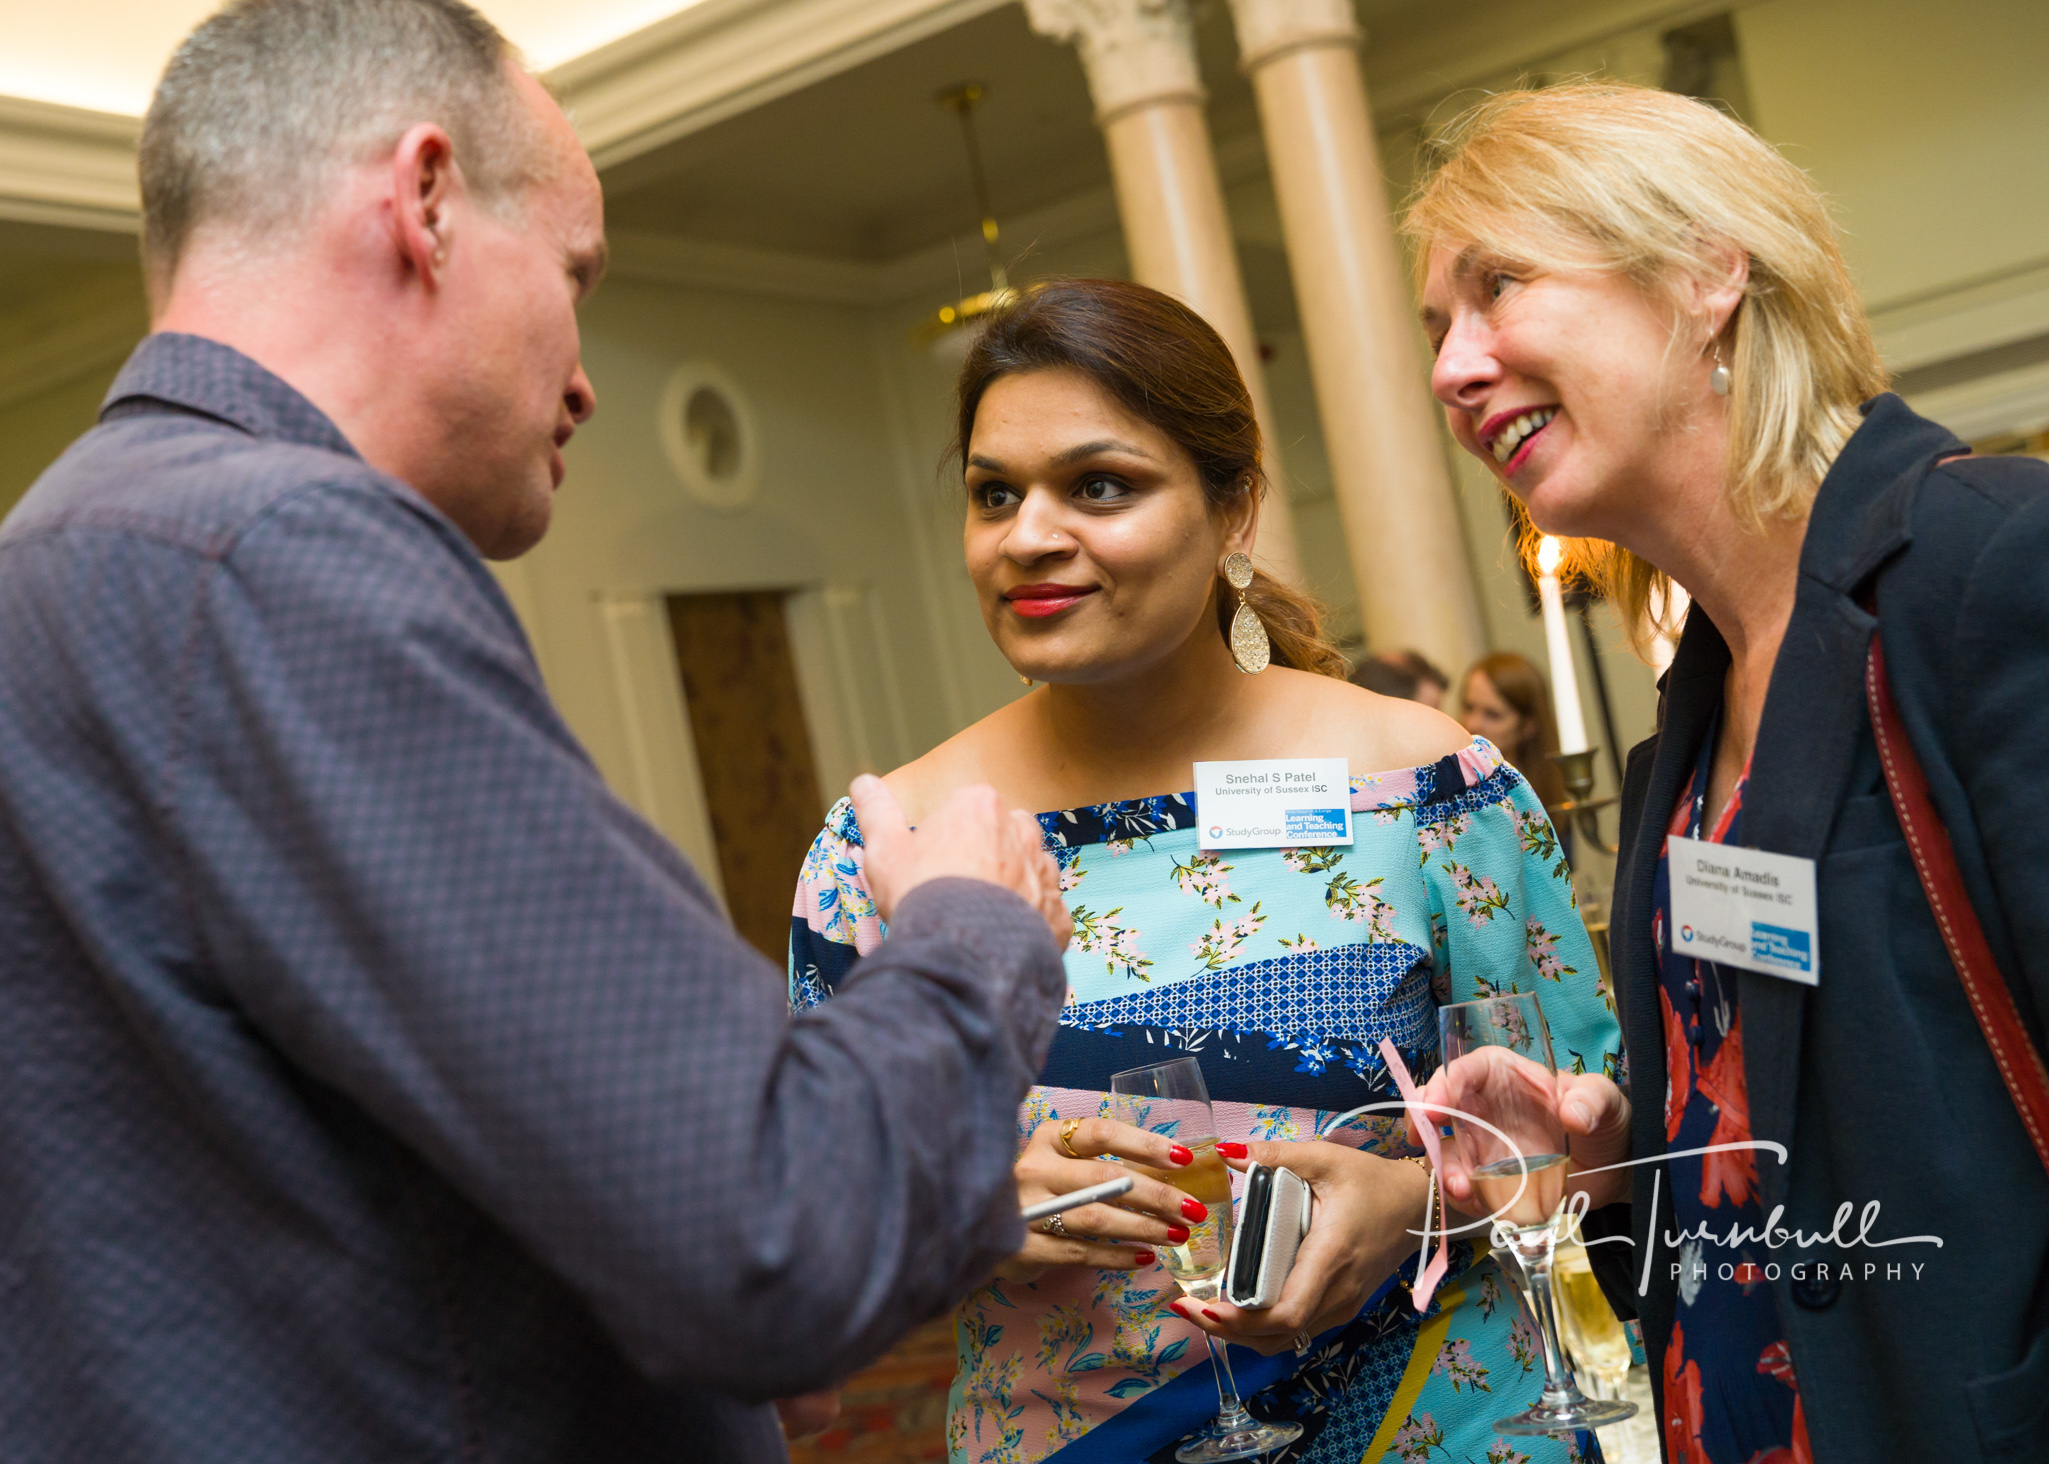 conference-event-photographer-queens-hotel-leeds-yorkshire-009.jpg